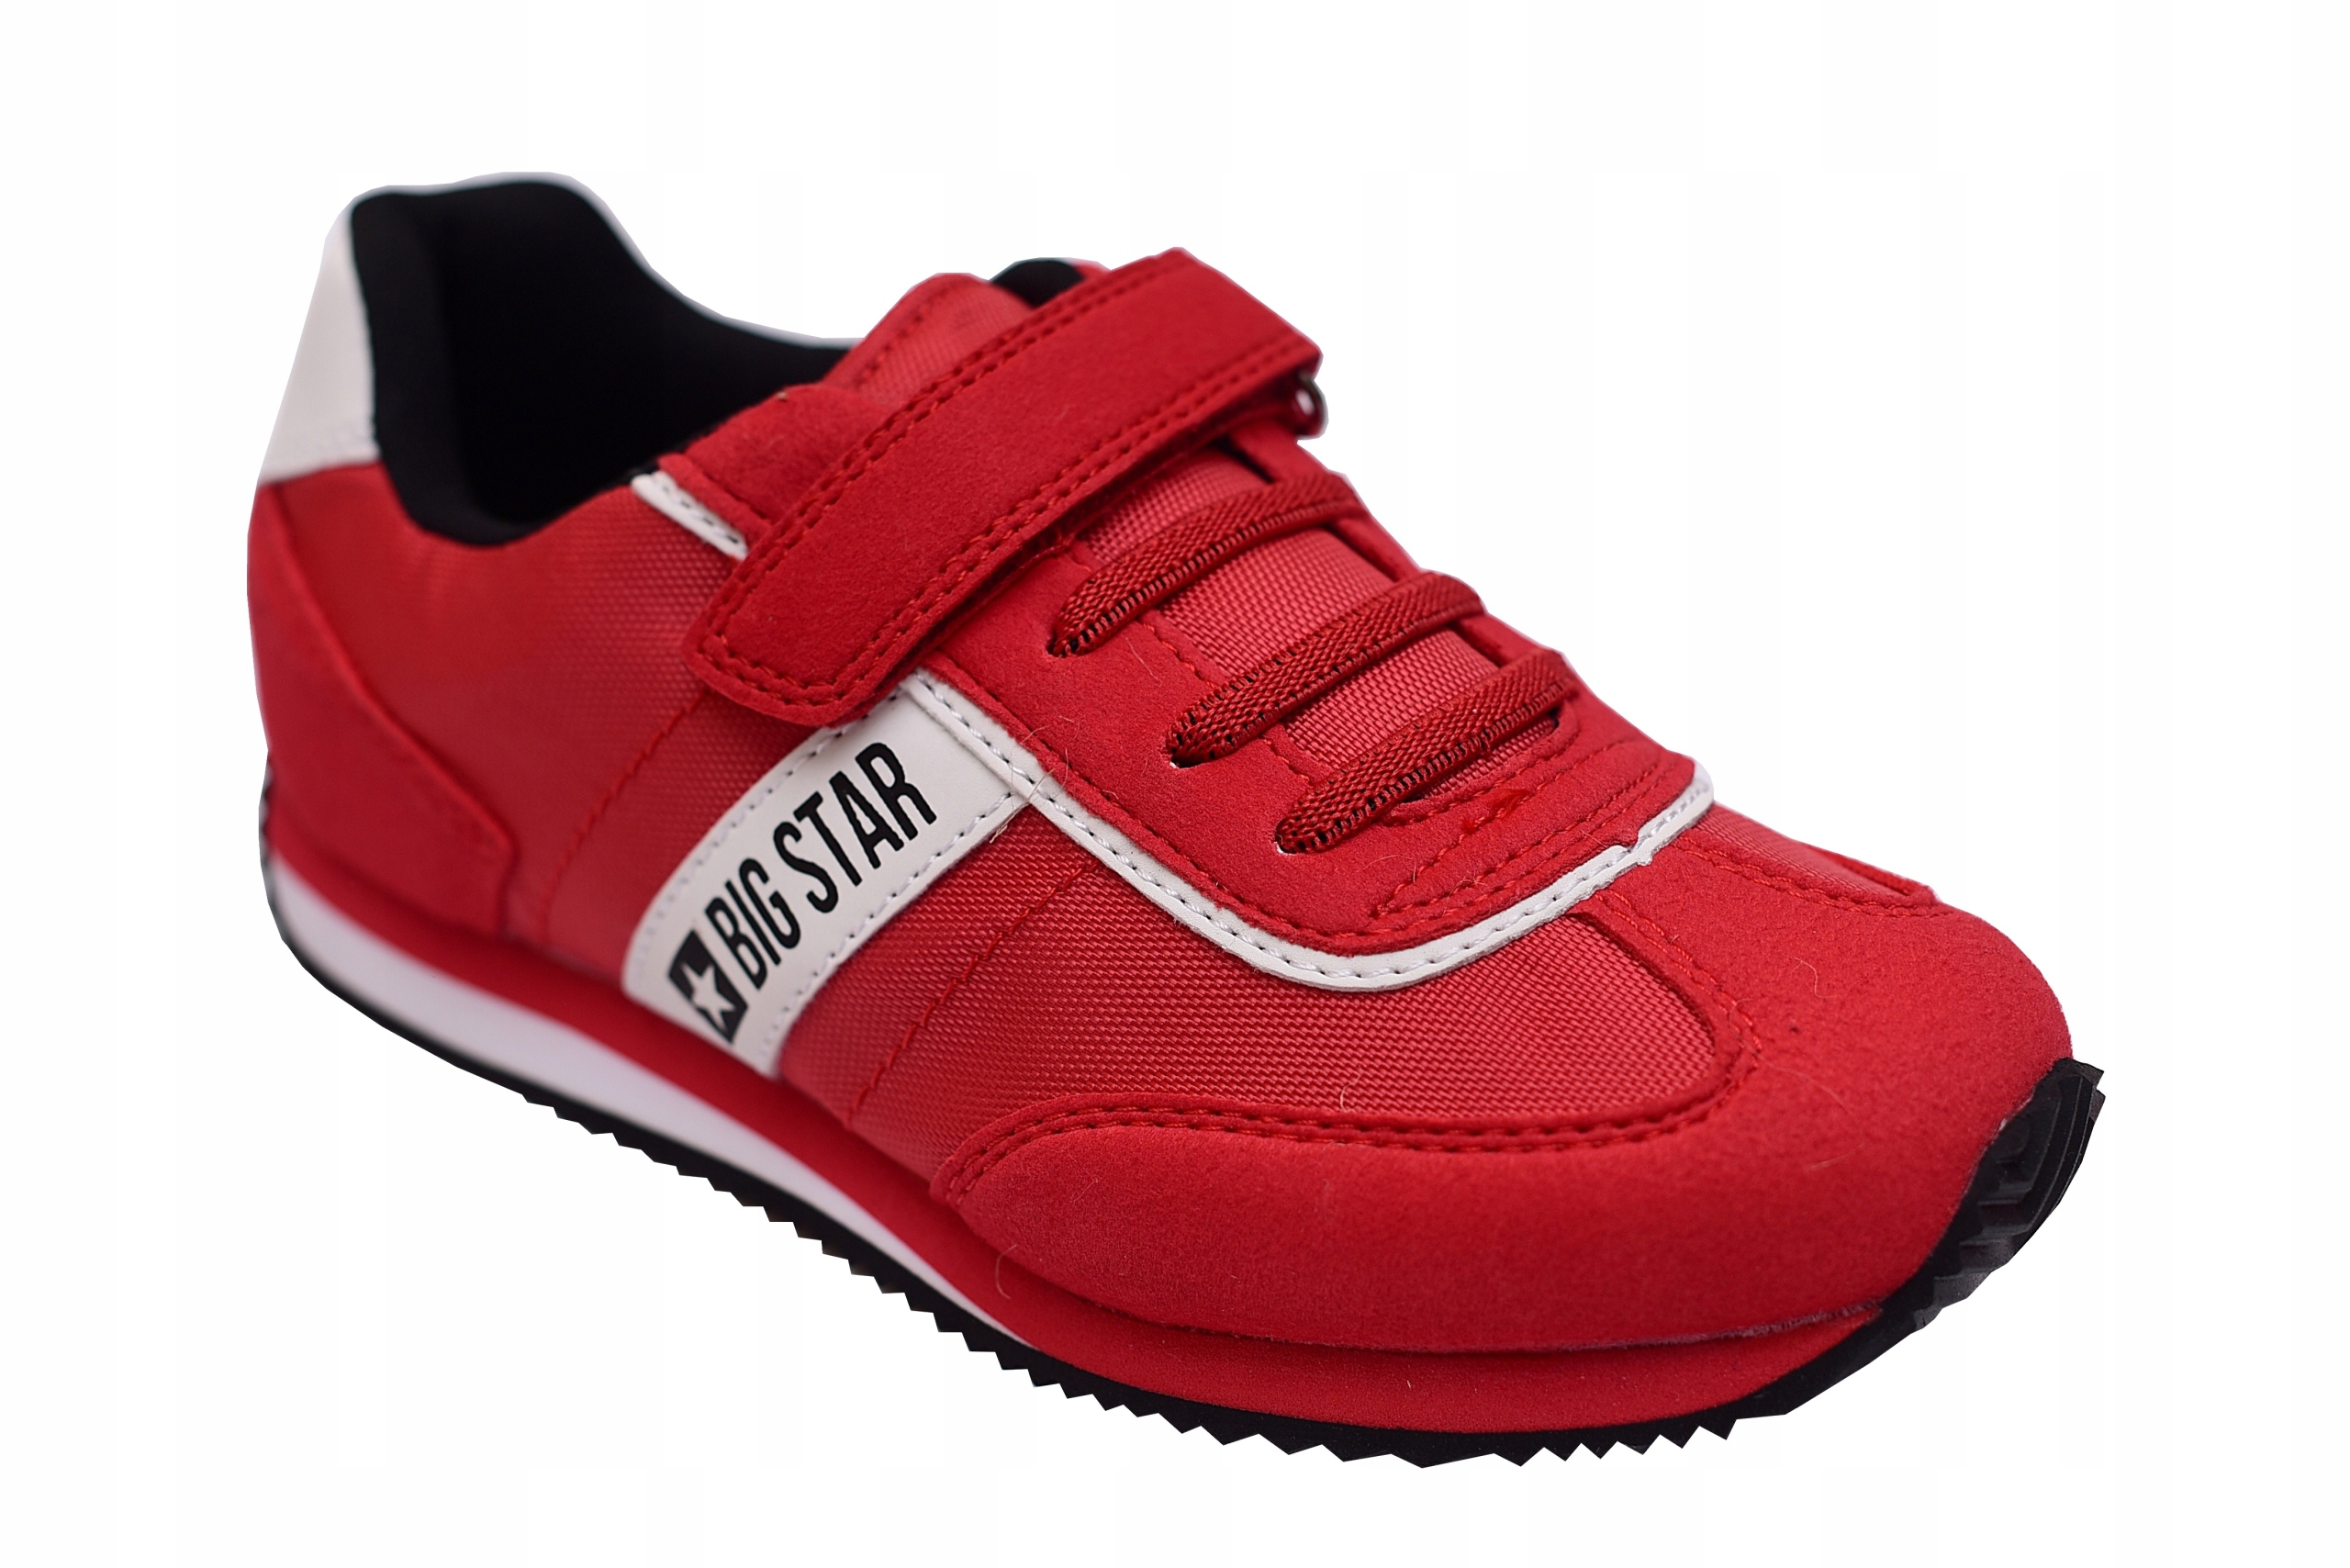 Buty Dzieciece Sport Adidasy Big Star Ff374135 33 9084792640 Allegro Pl